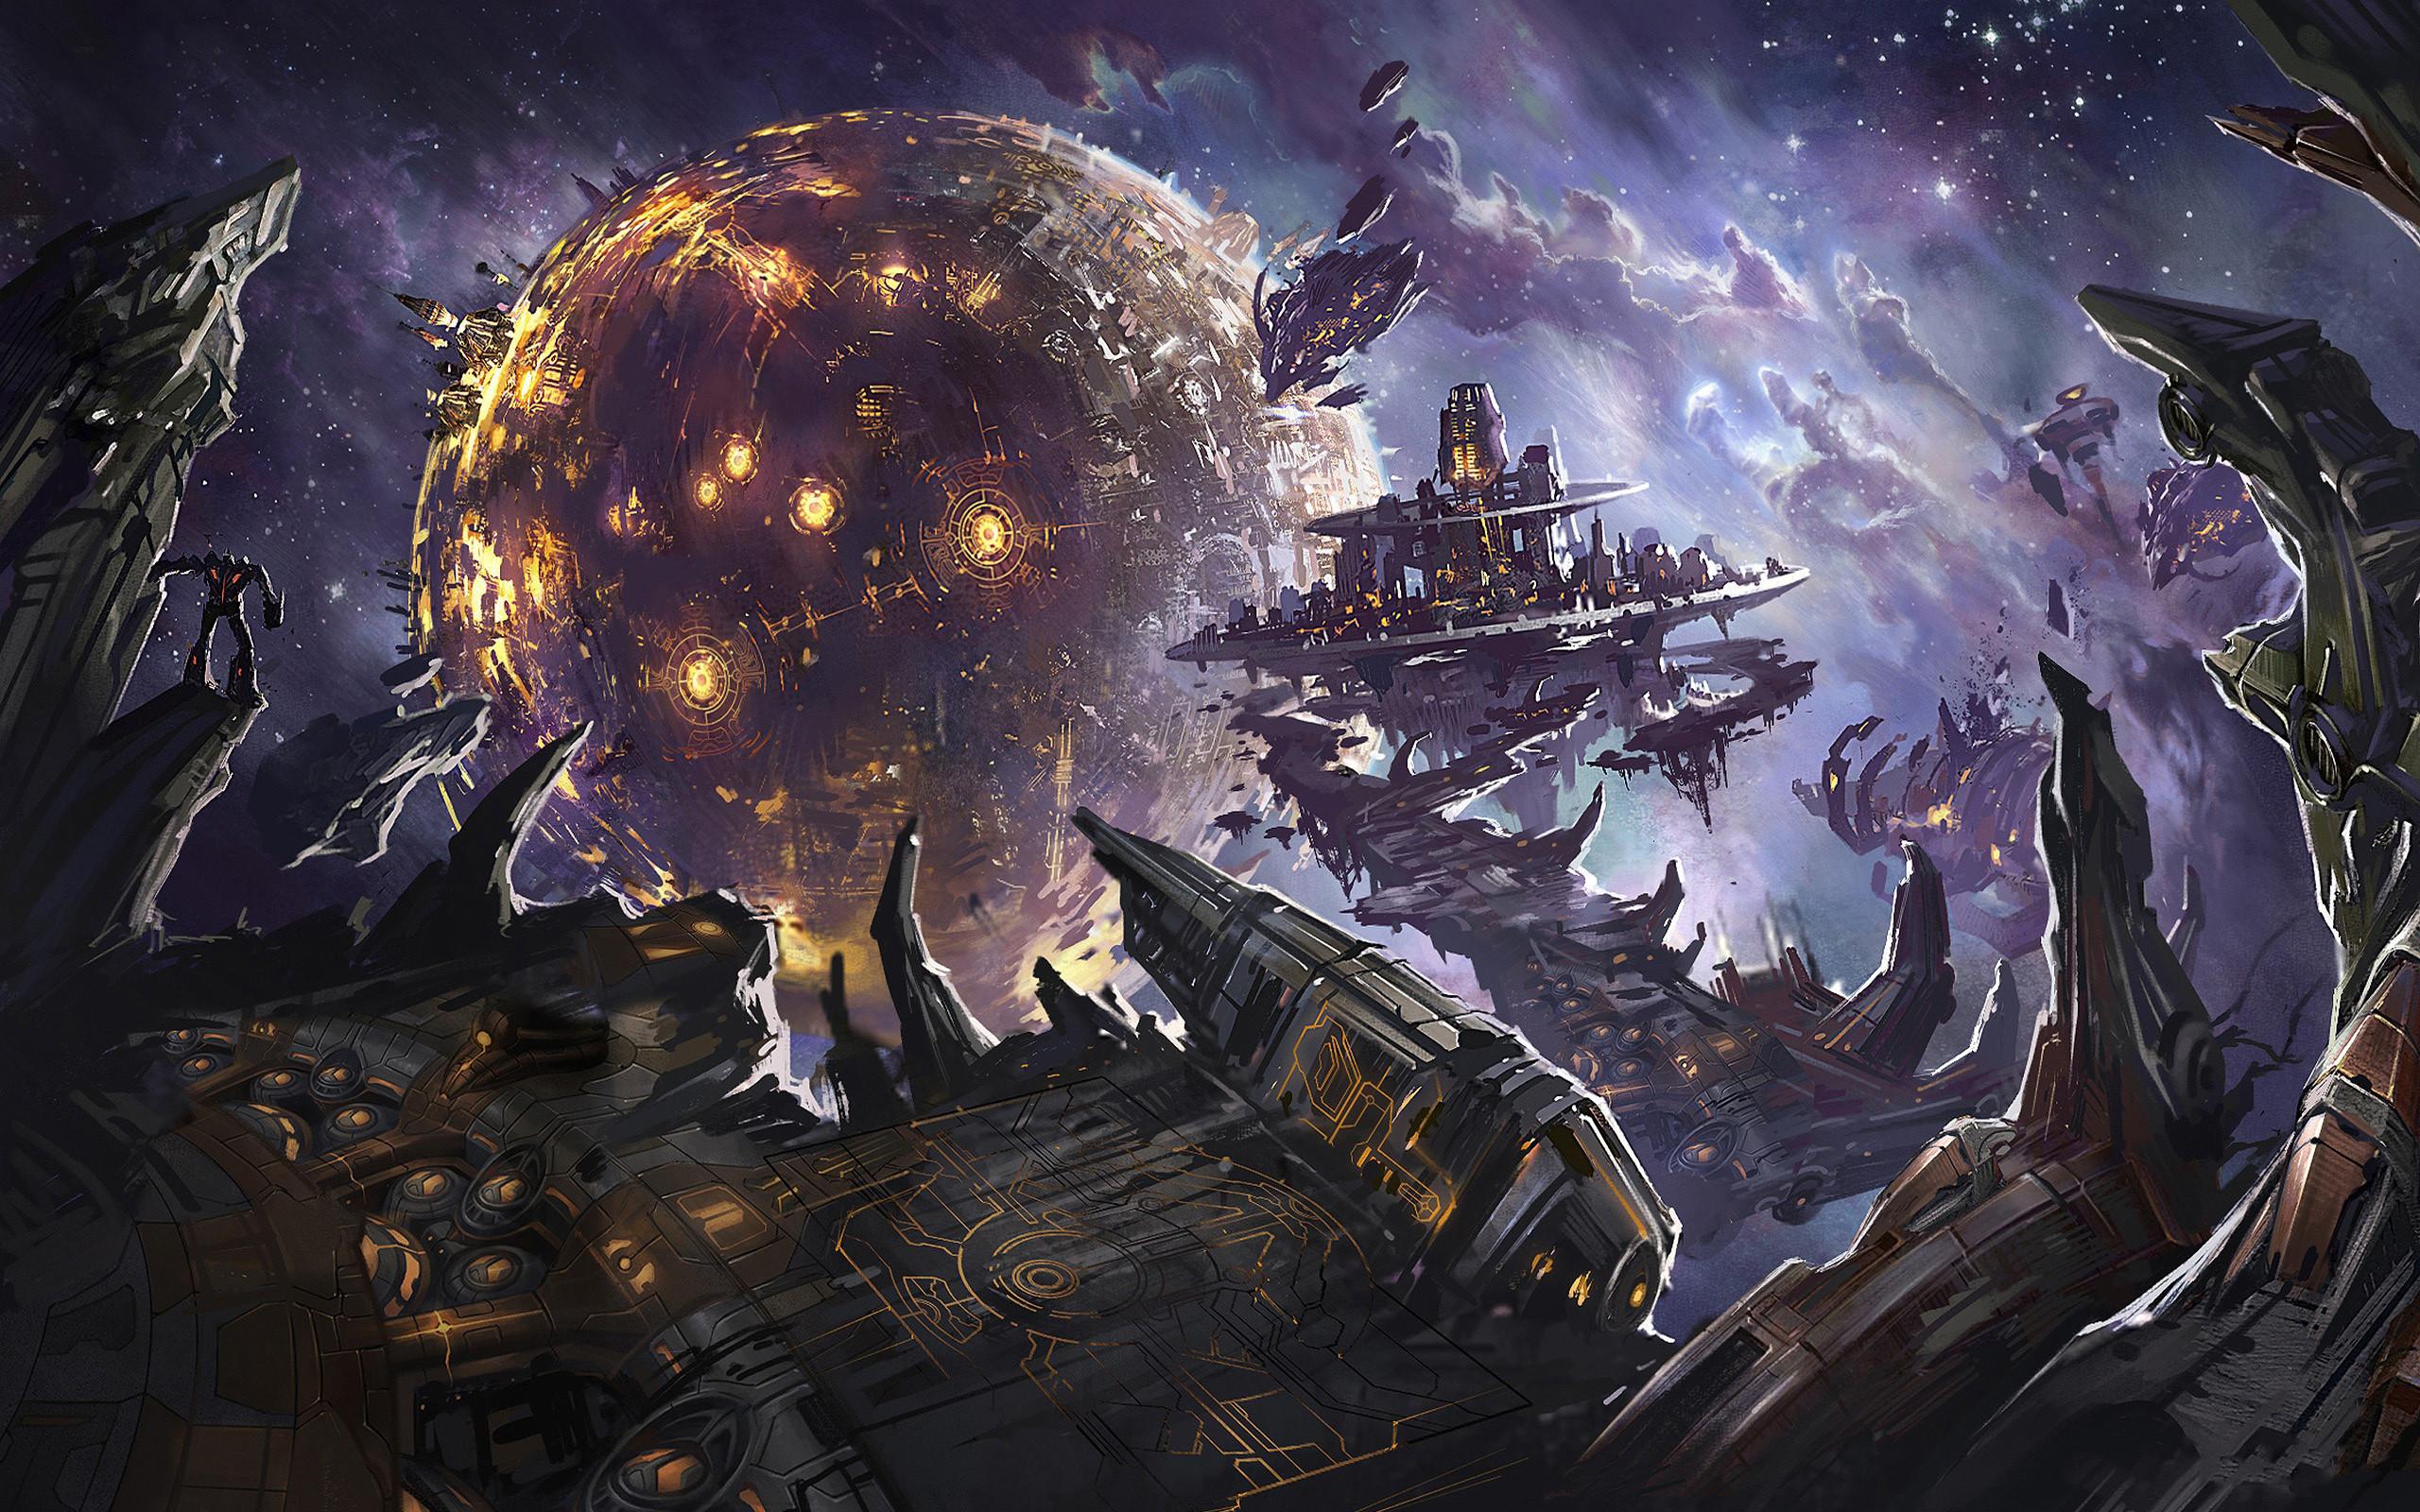 Space/Fantasy Wallpaper Set 89